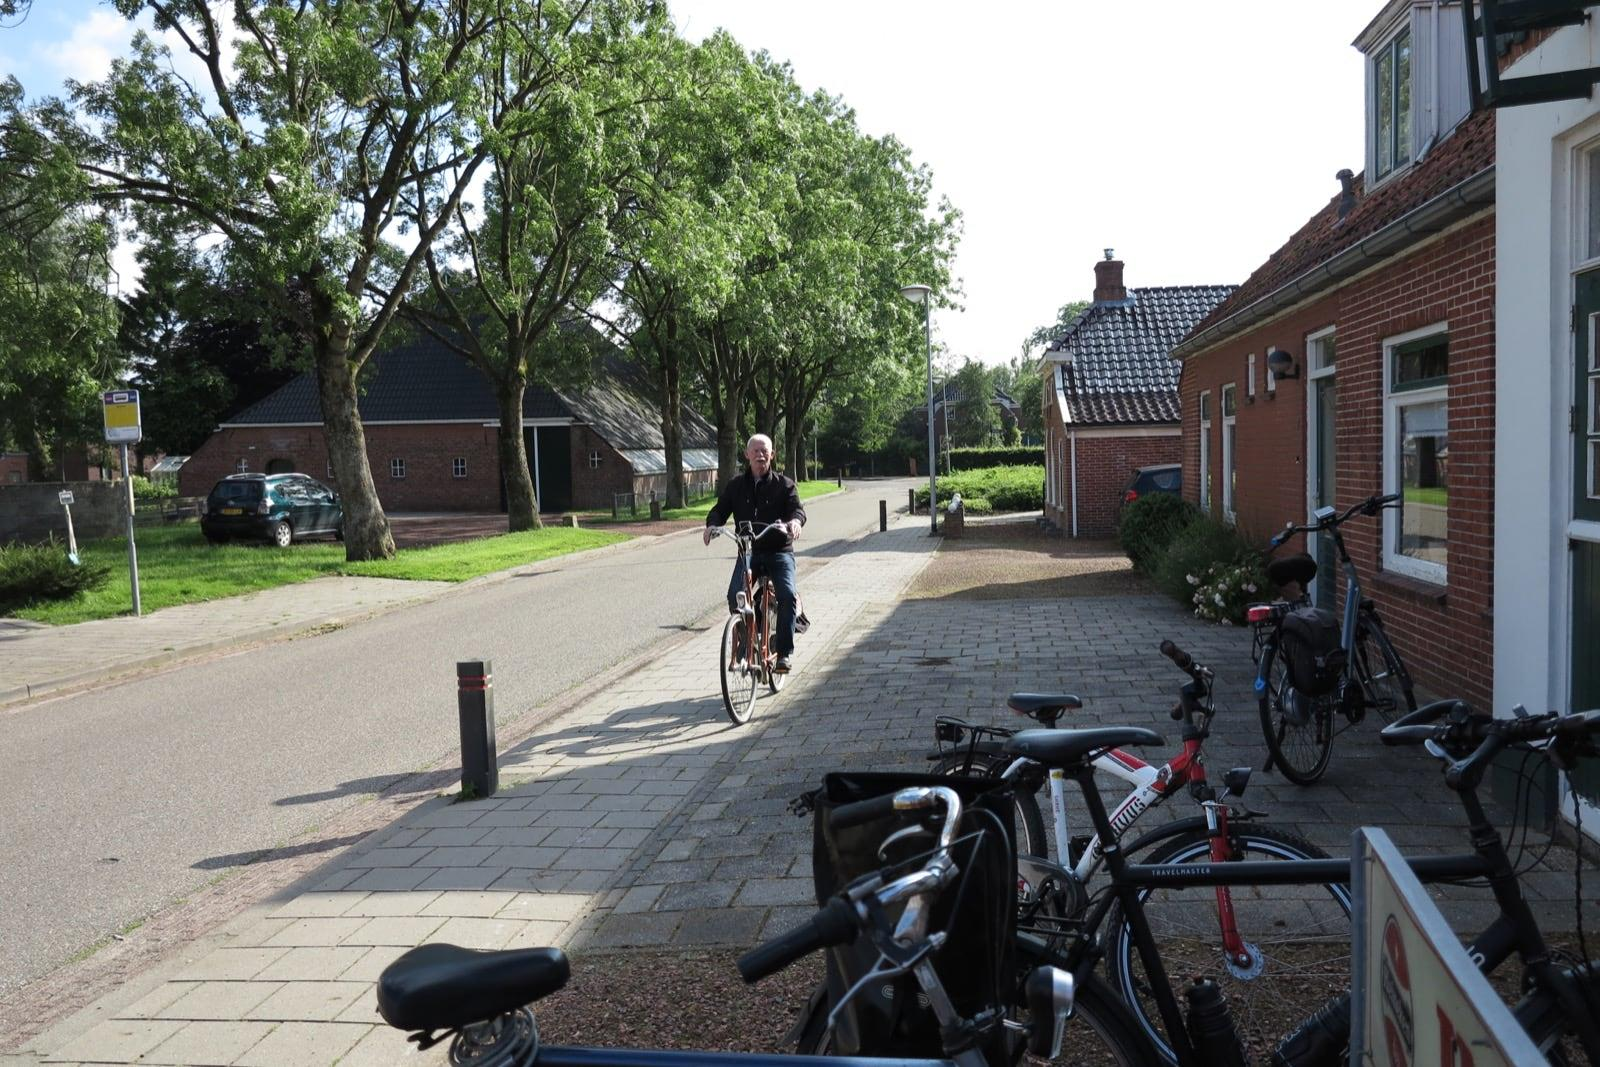 et-fiets-en-fietser-53-thesinger-fietstocht---jo-schuppert-oi.jpg